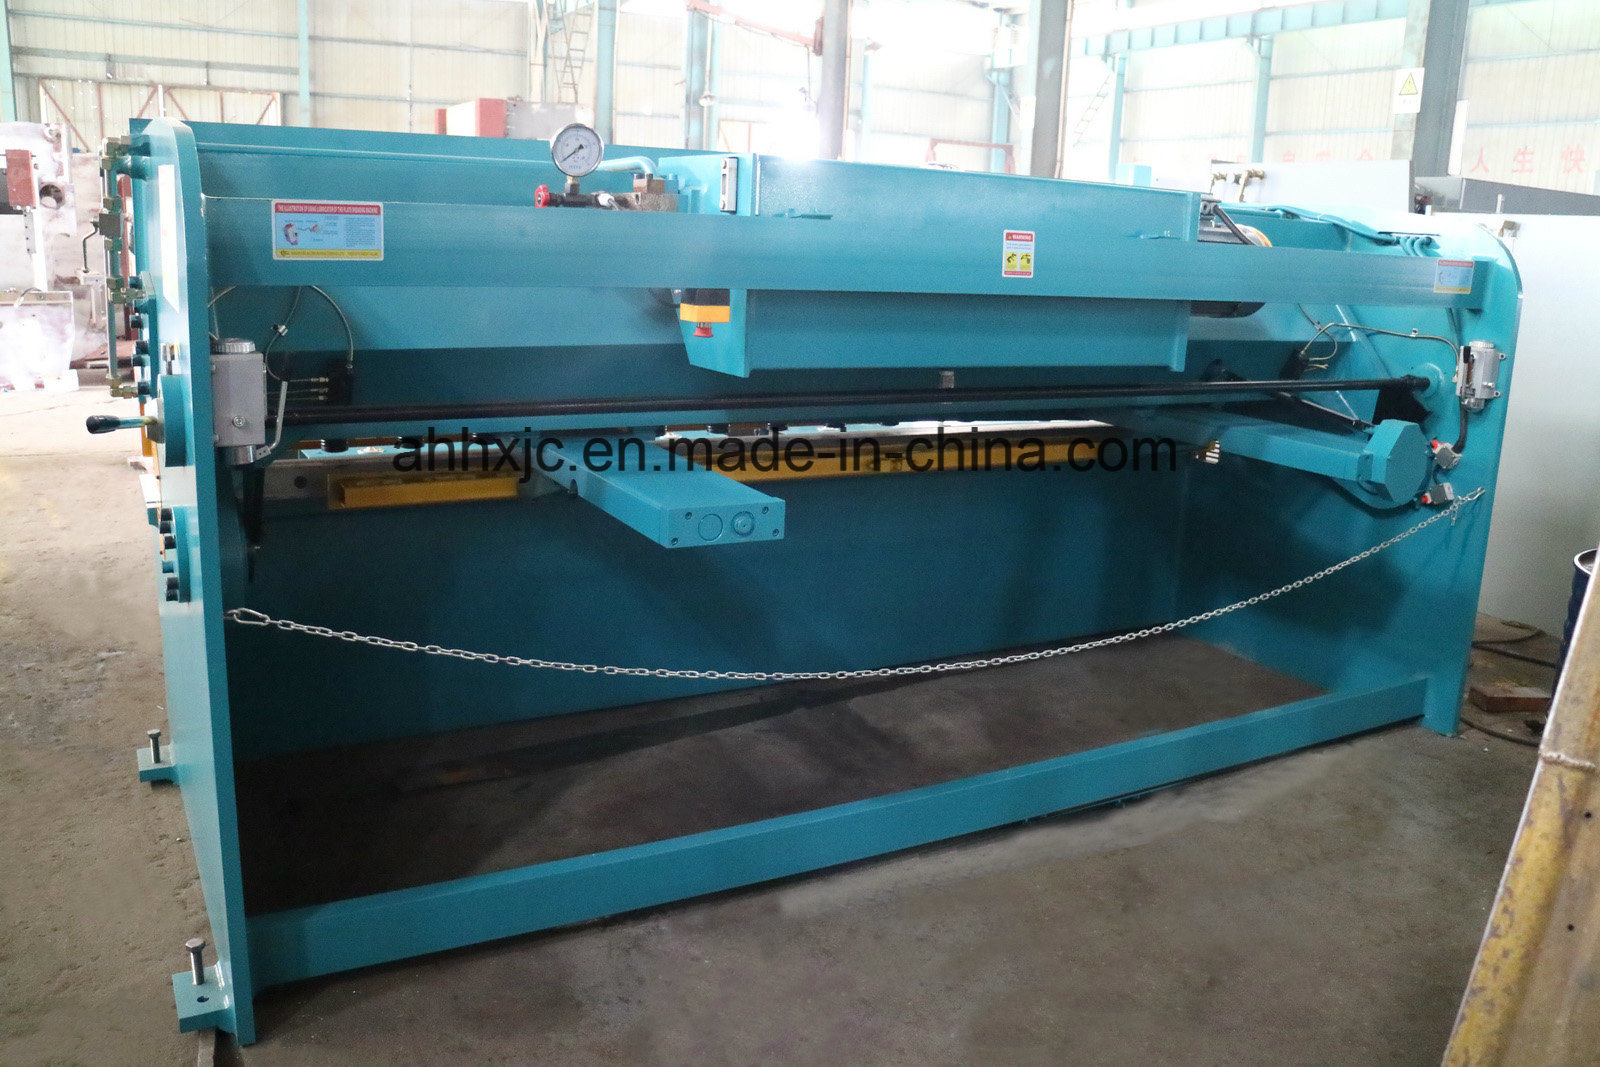 Nc Hydraulic Shearing Machine for Metal Making